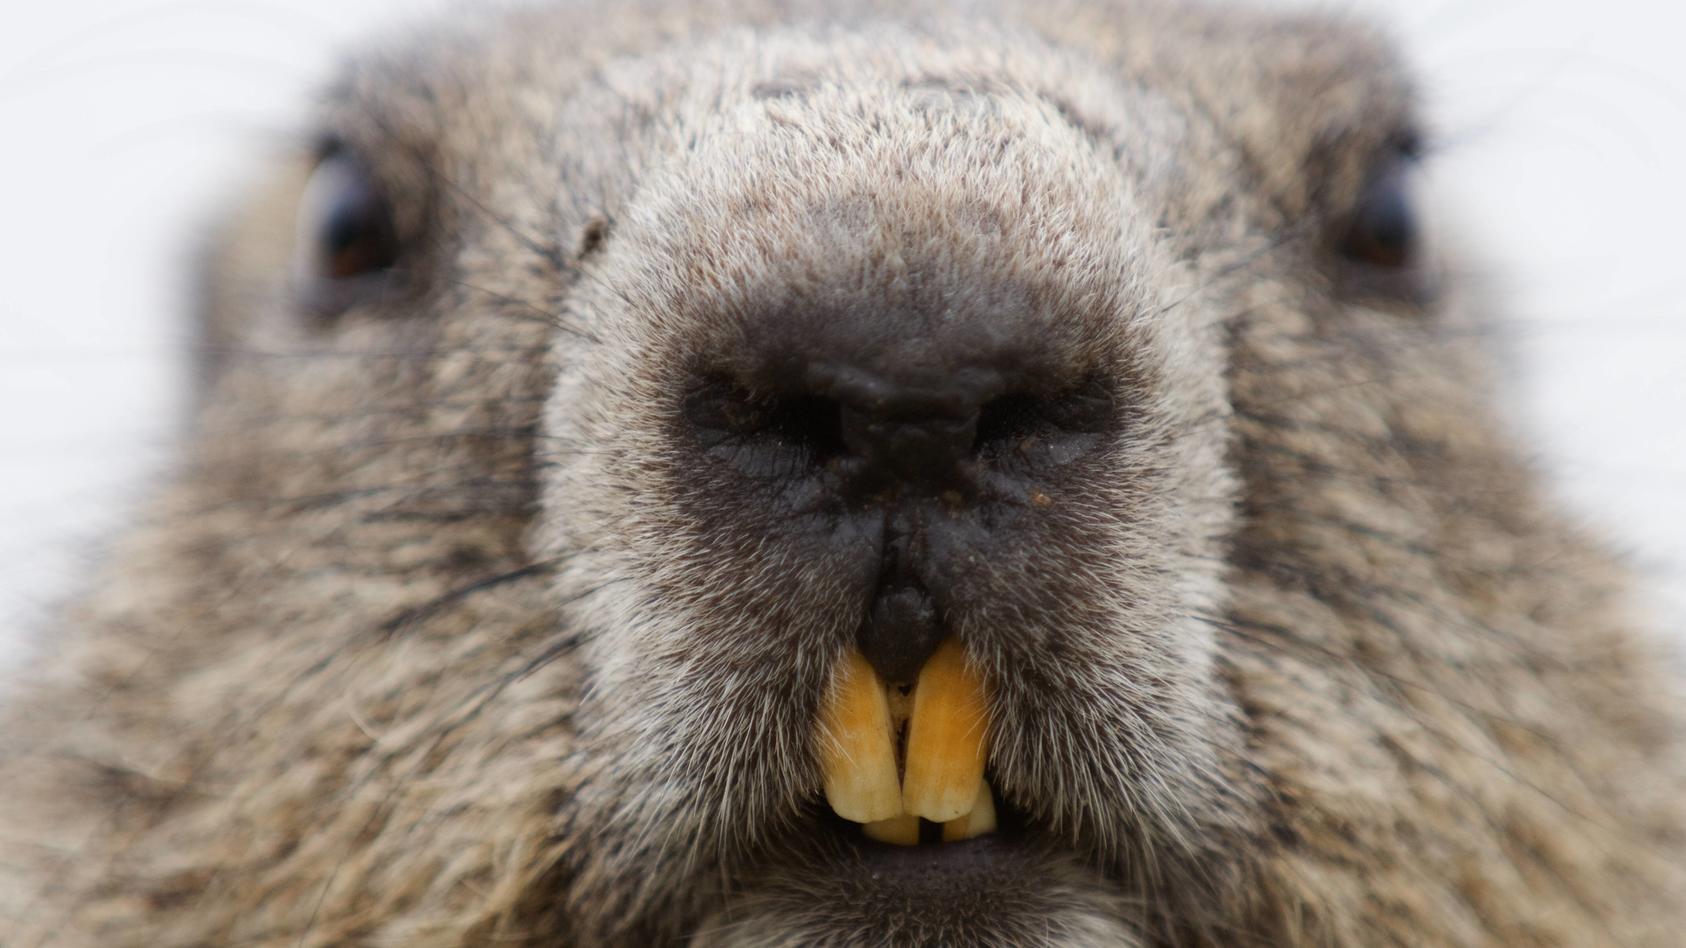 Alpine marmot (Marmota marmota) close up Hohe Tauern National Park, Austria, July PUBLICATIONxINxGERxSUIxAUTxONLY 13976